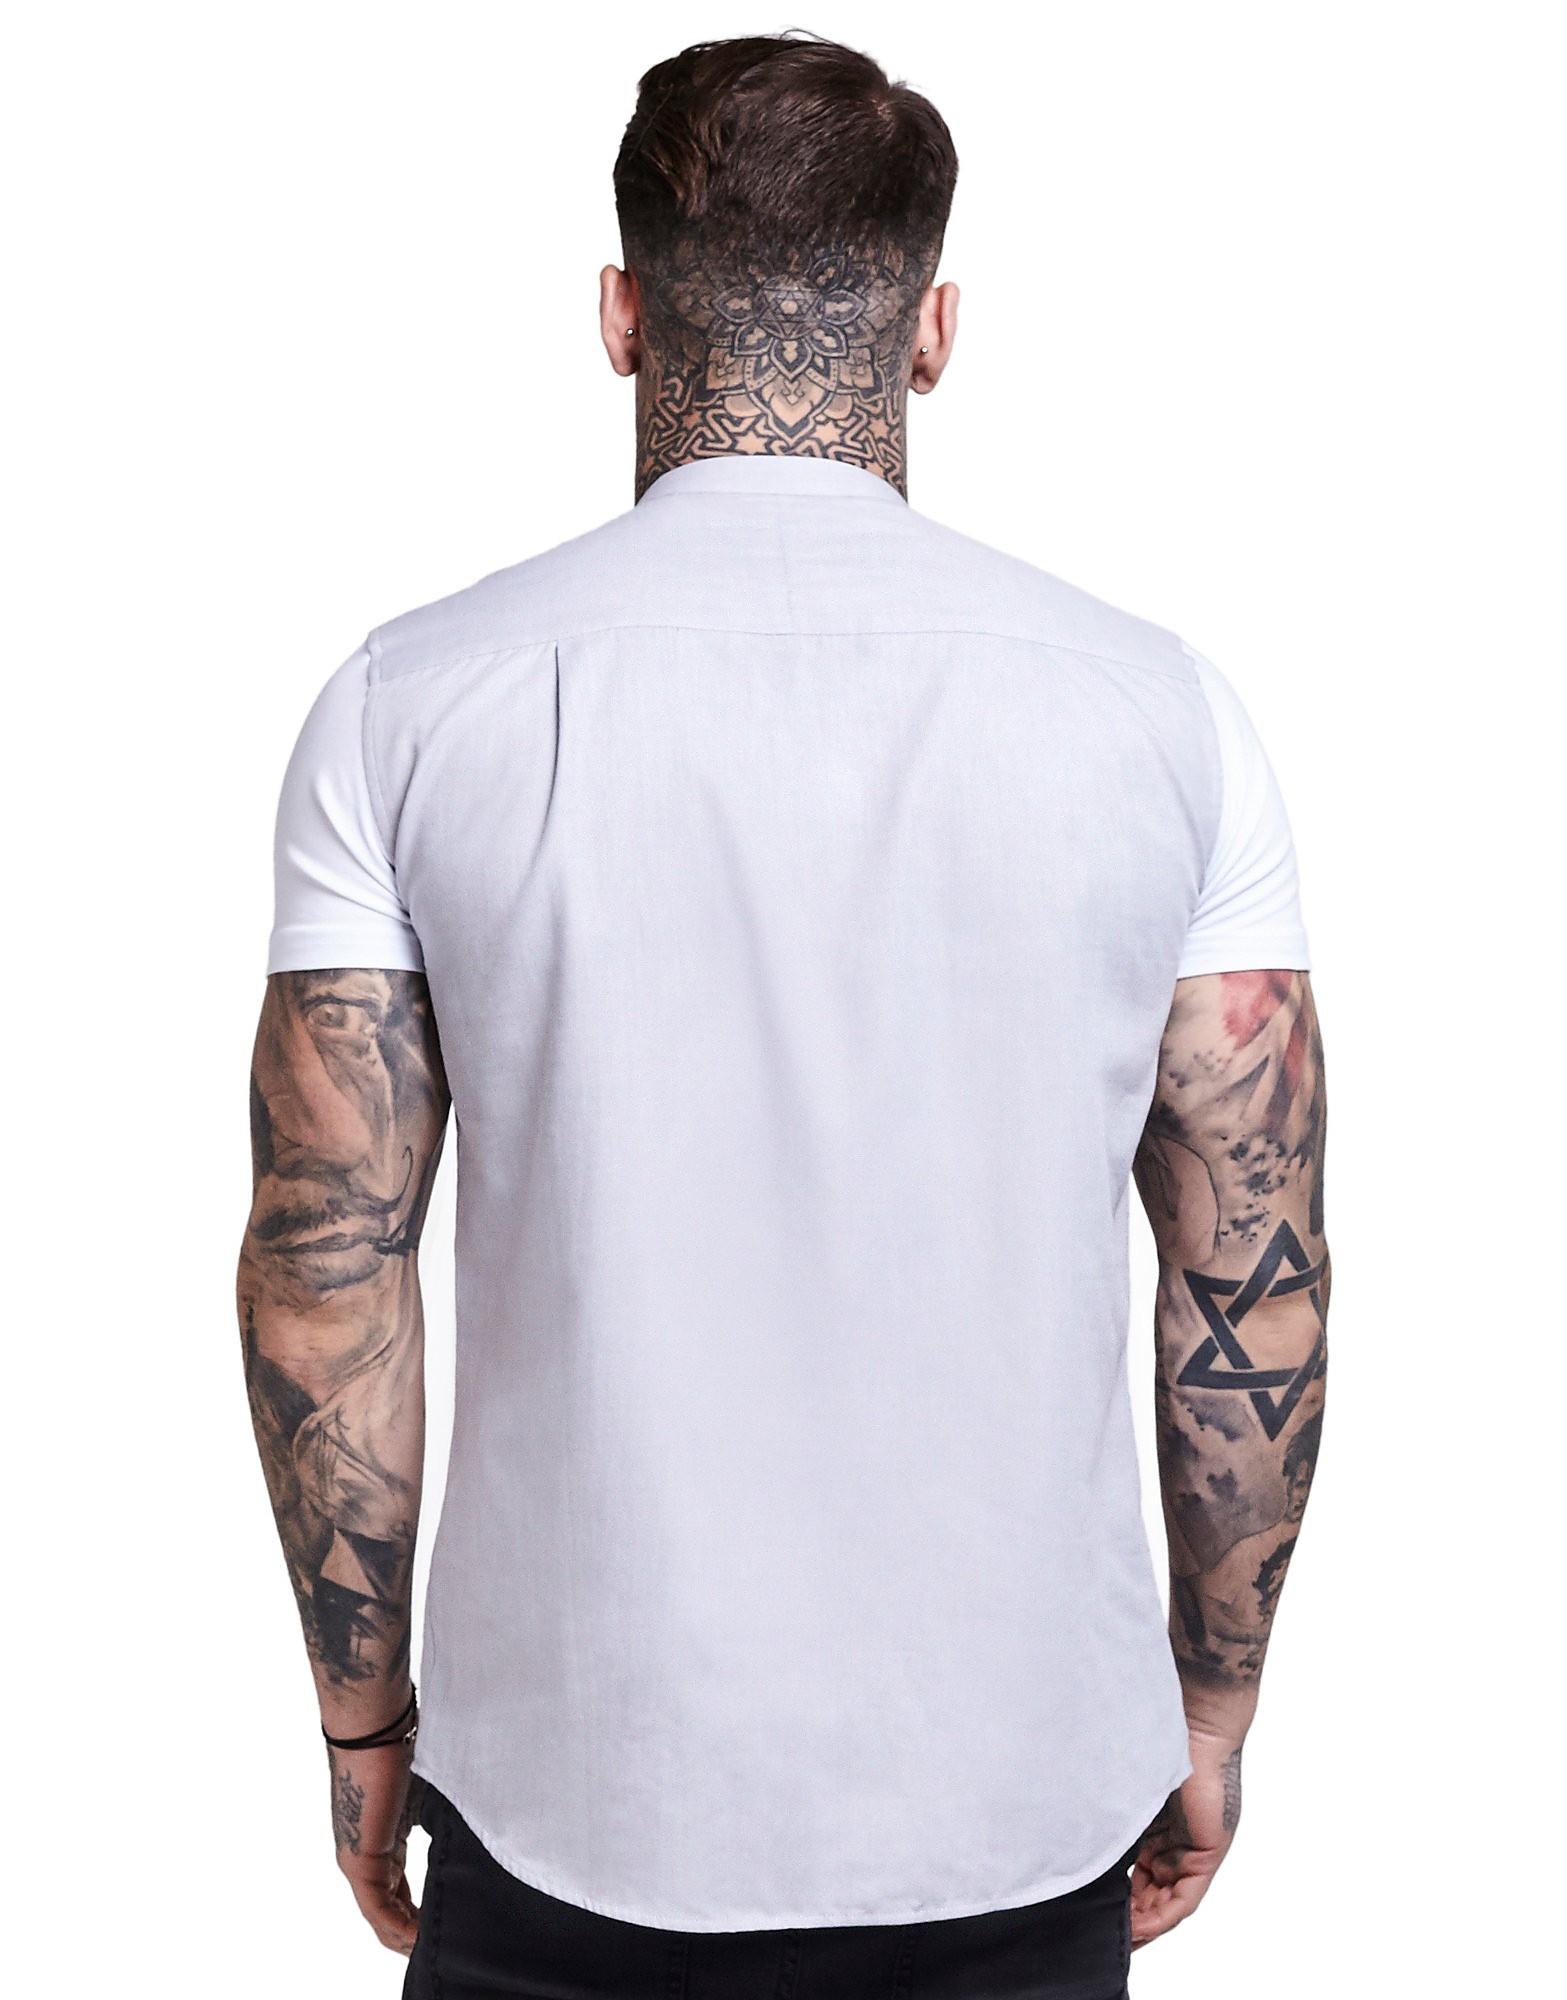 SikSilk Contrast Oxford Short Sleeve Shirt